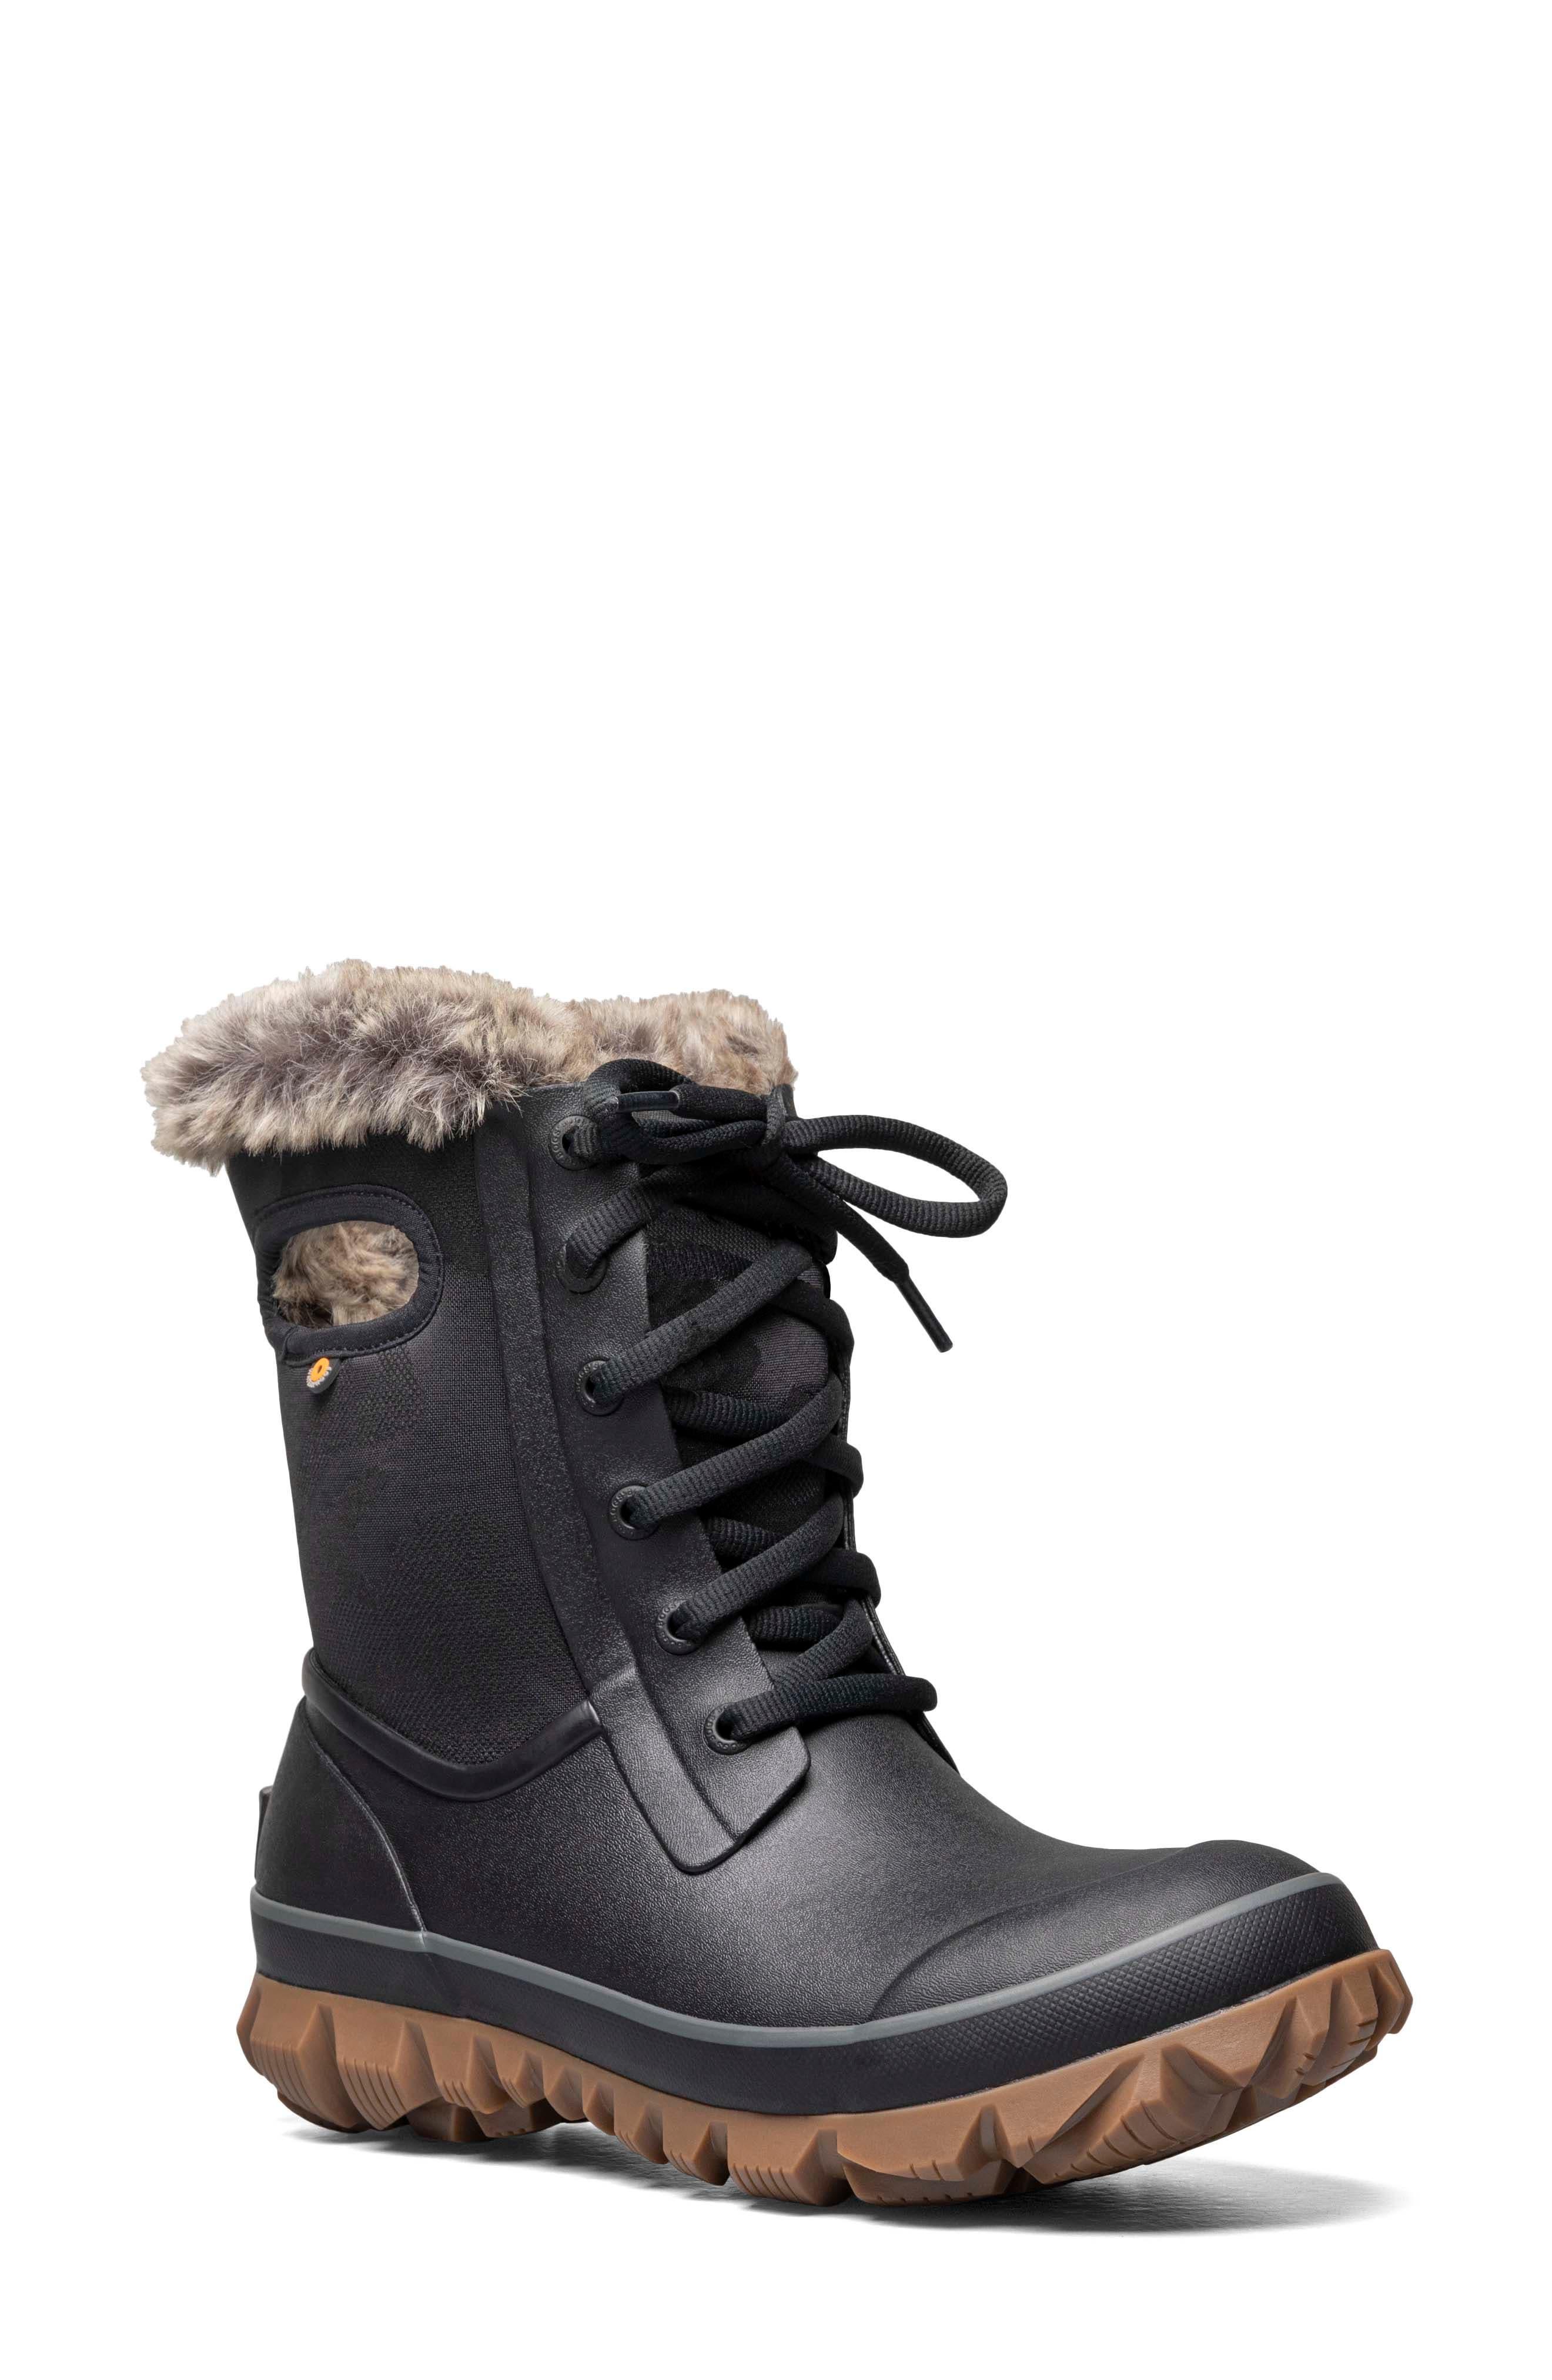 Arcata Insulated Waterproof Snow Boot